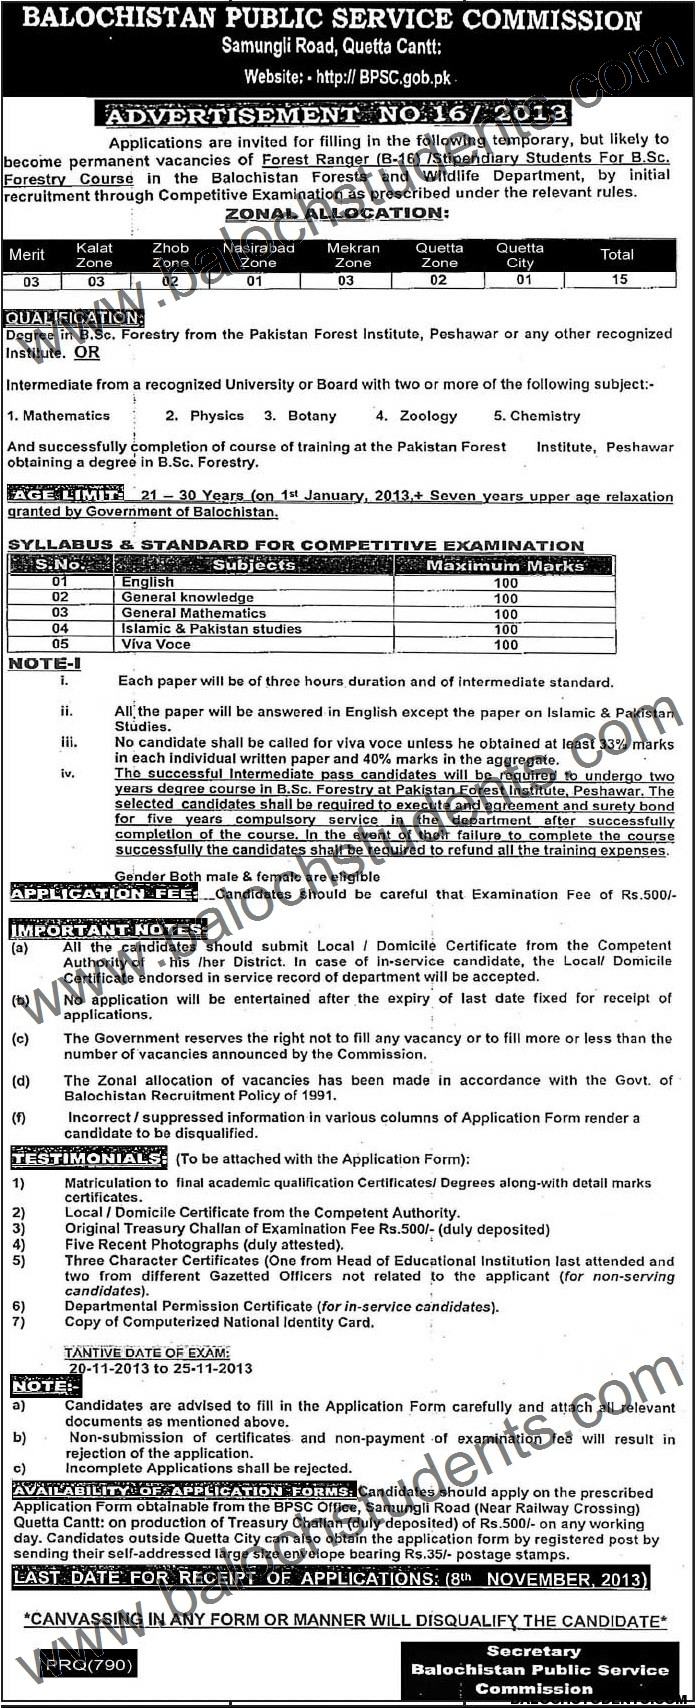 BPSC Jobs Ad16-2013